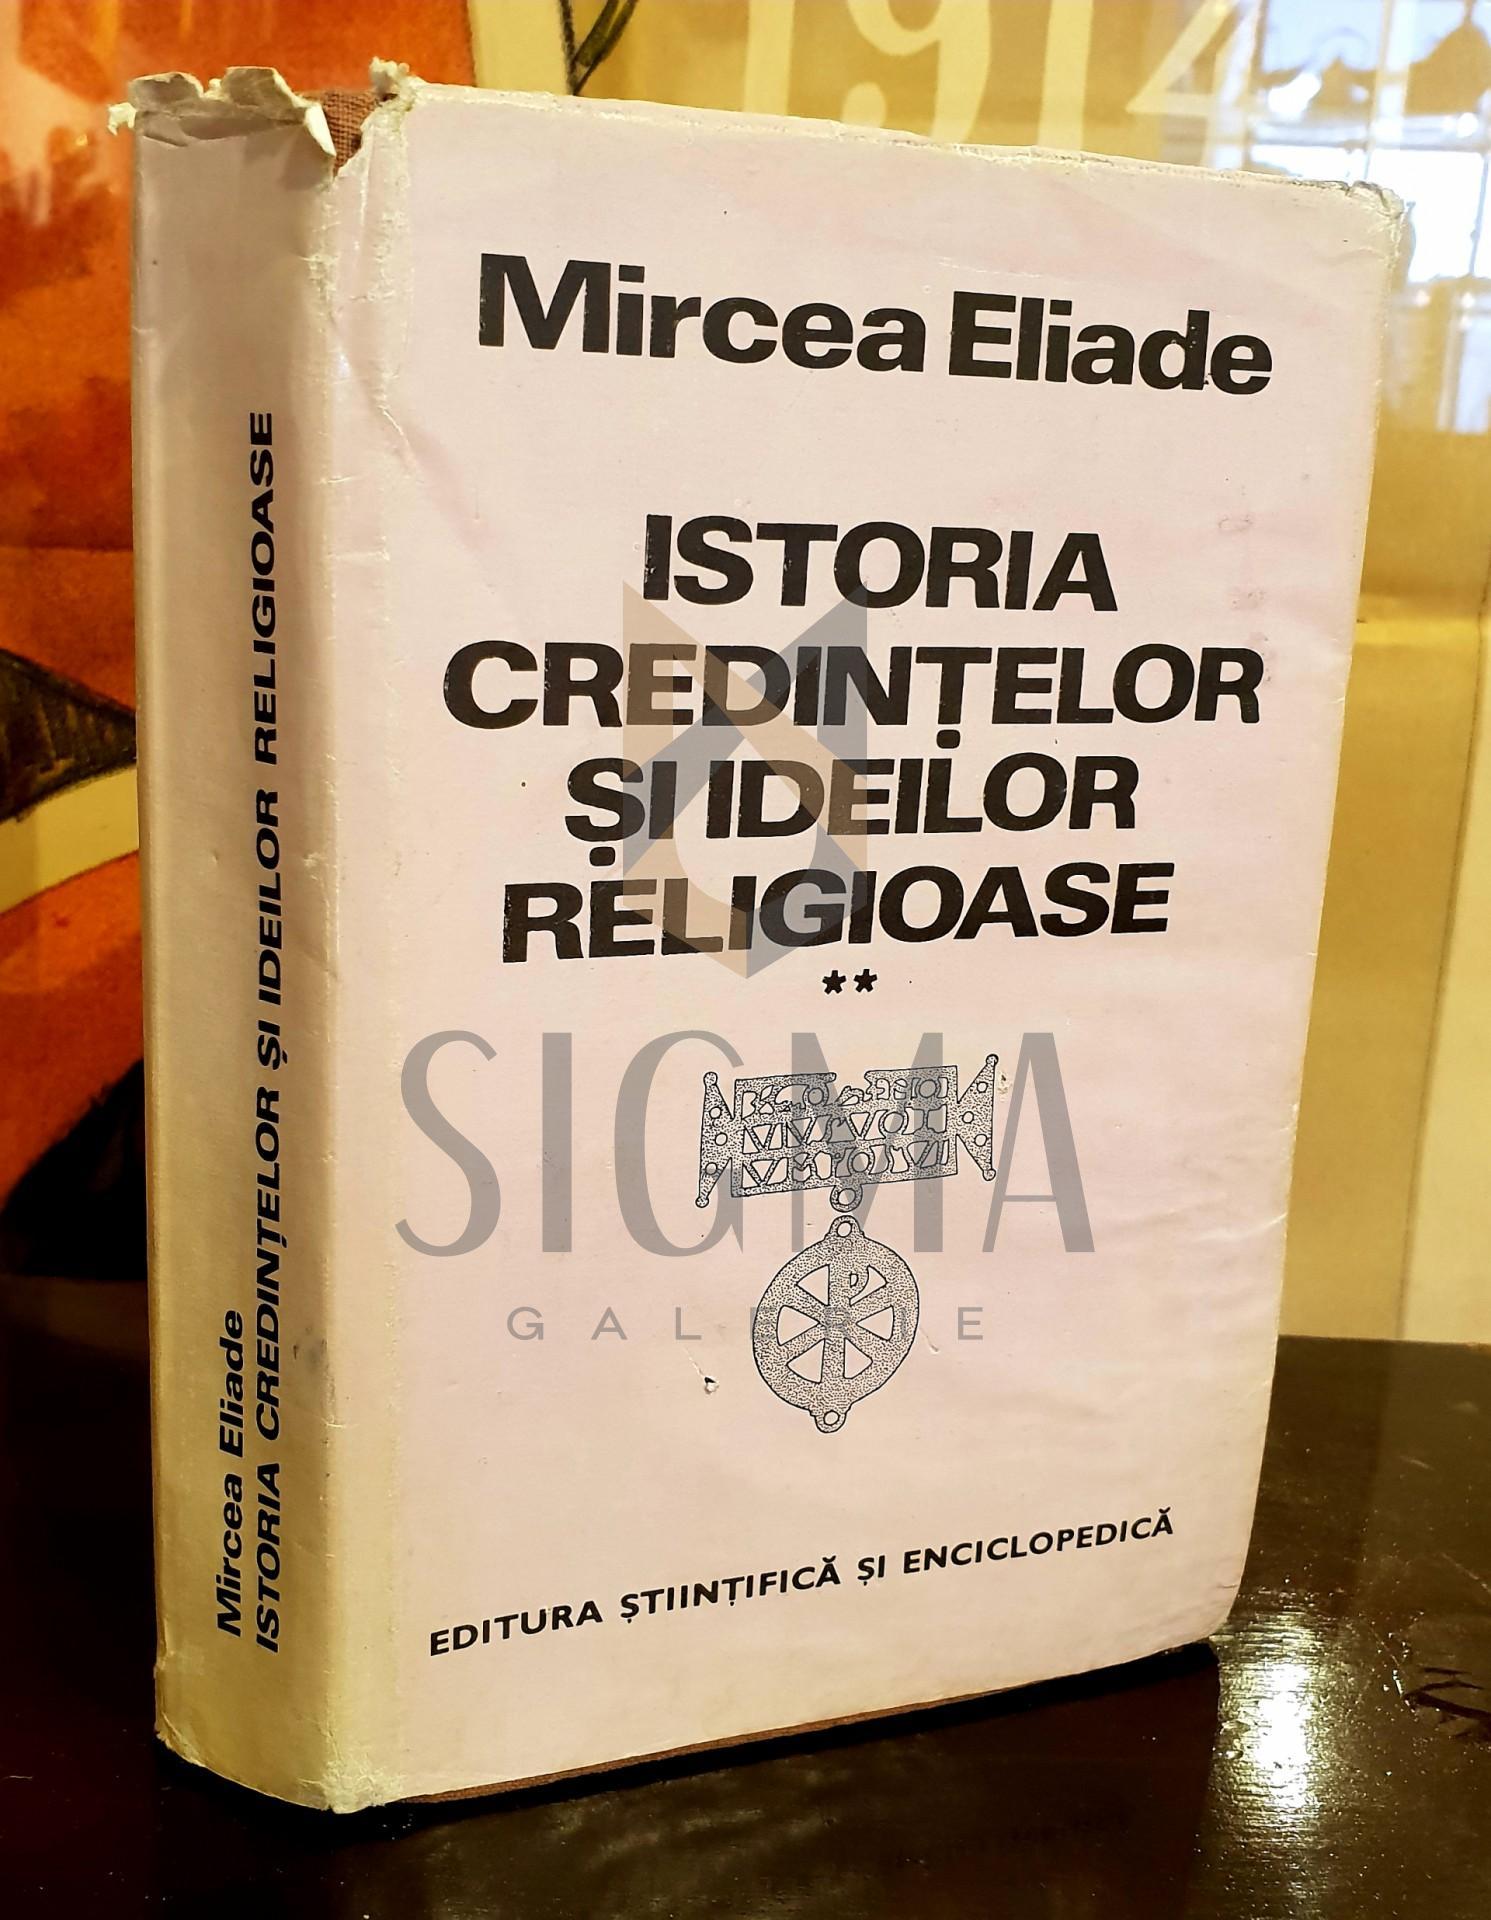 ISTORIA CREDINTELOR SI IDEILOR RELIGIOASE